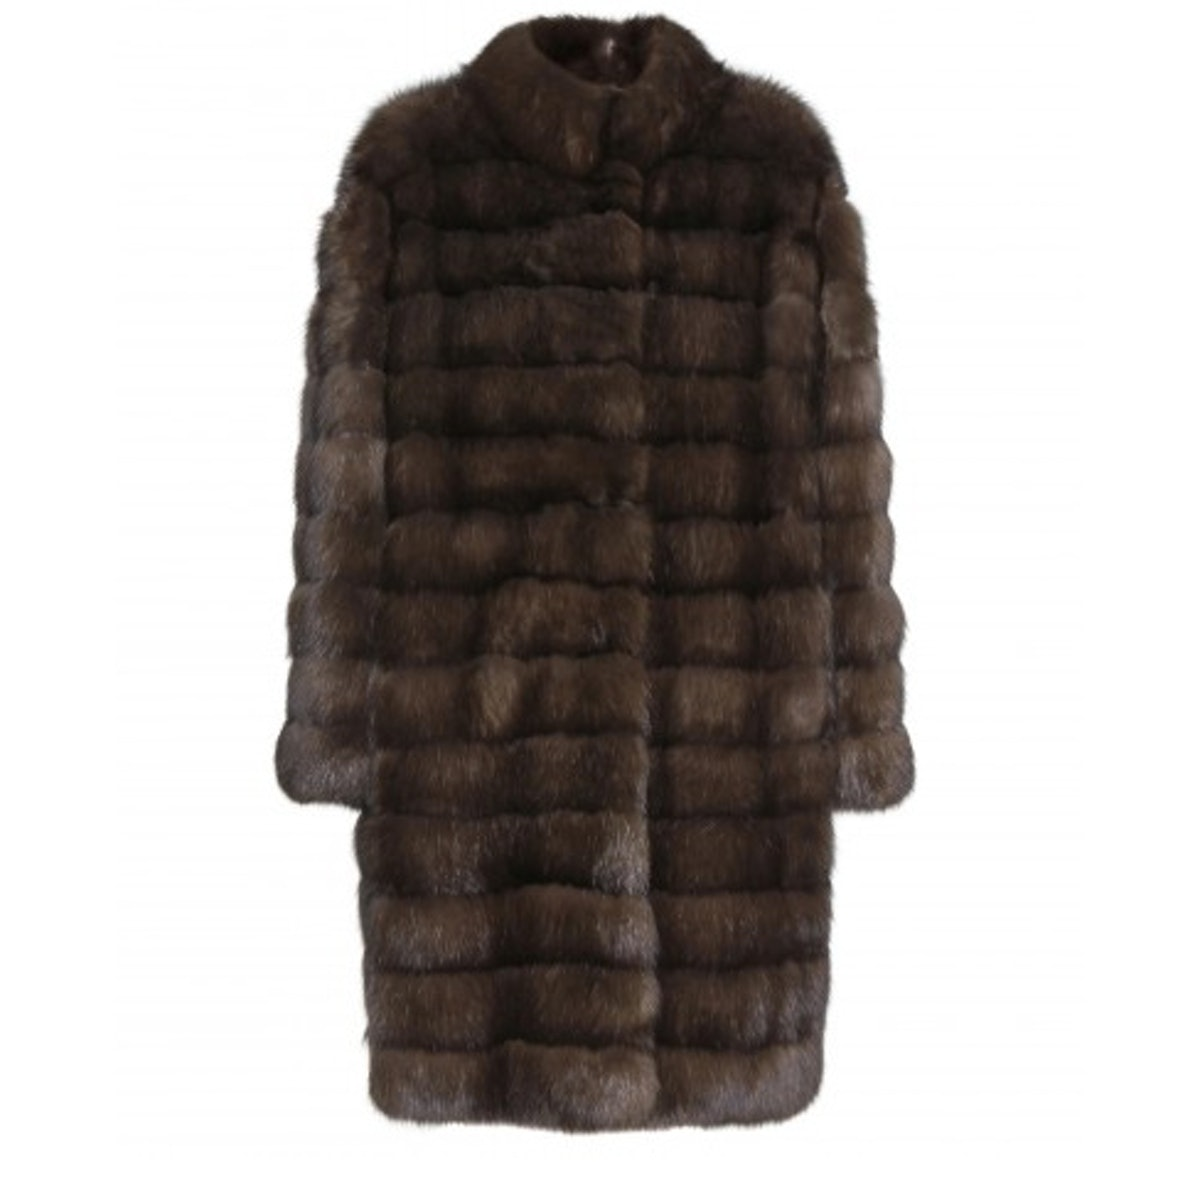 Manzoni 24 Barguzin Sable fur coat